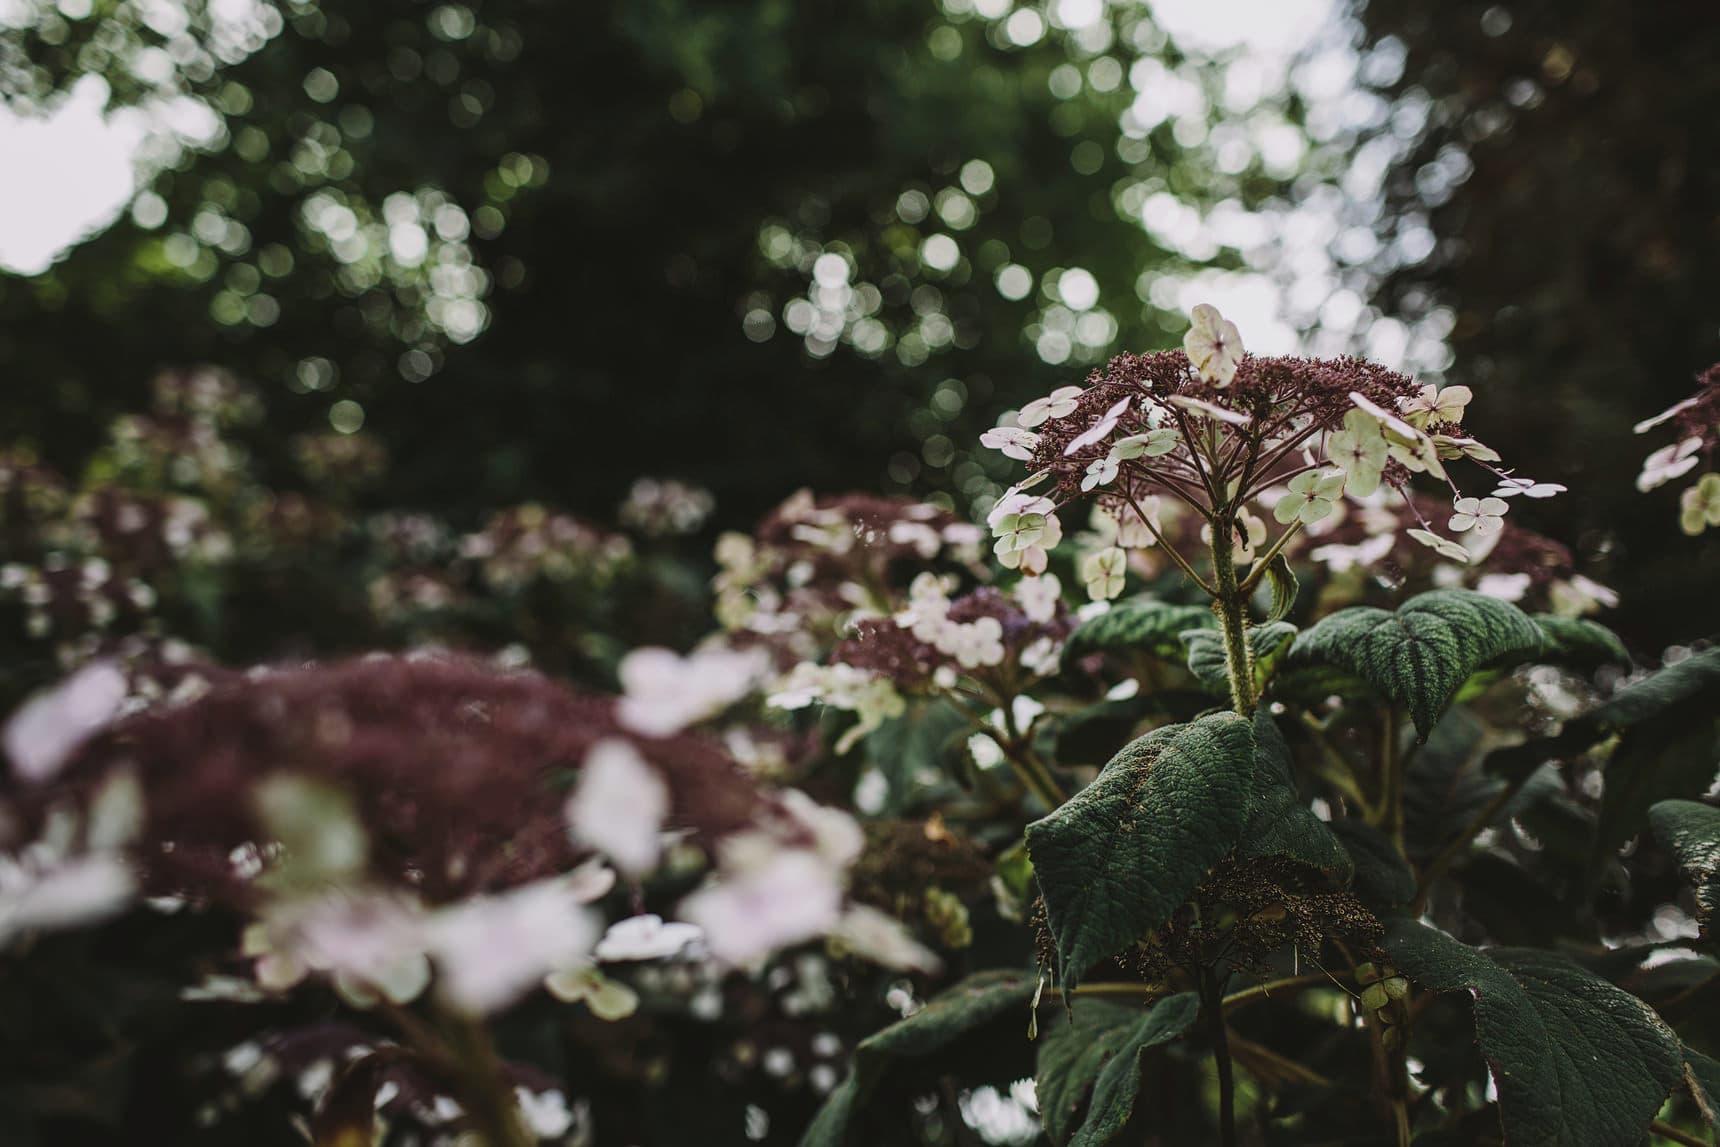 sezincote house gardens